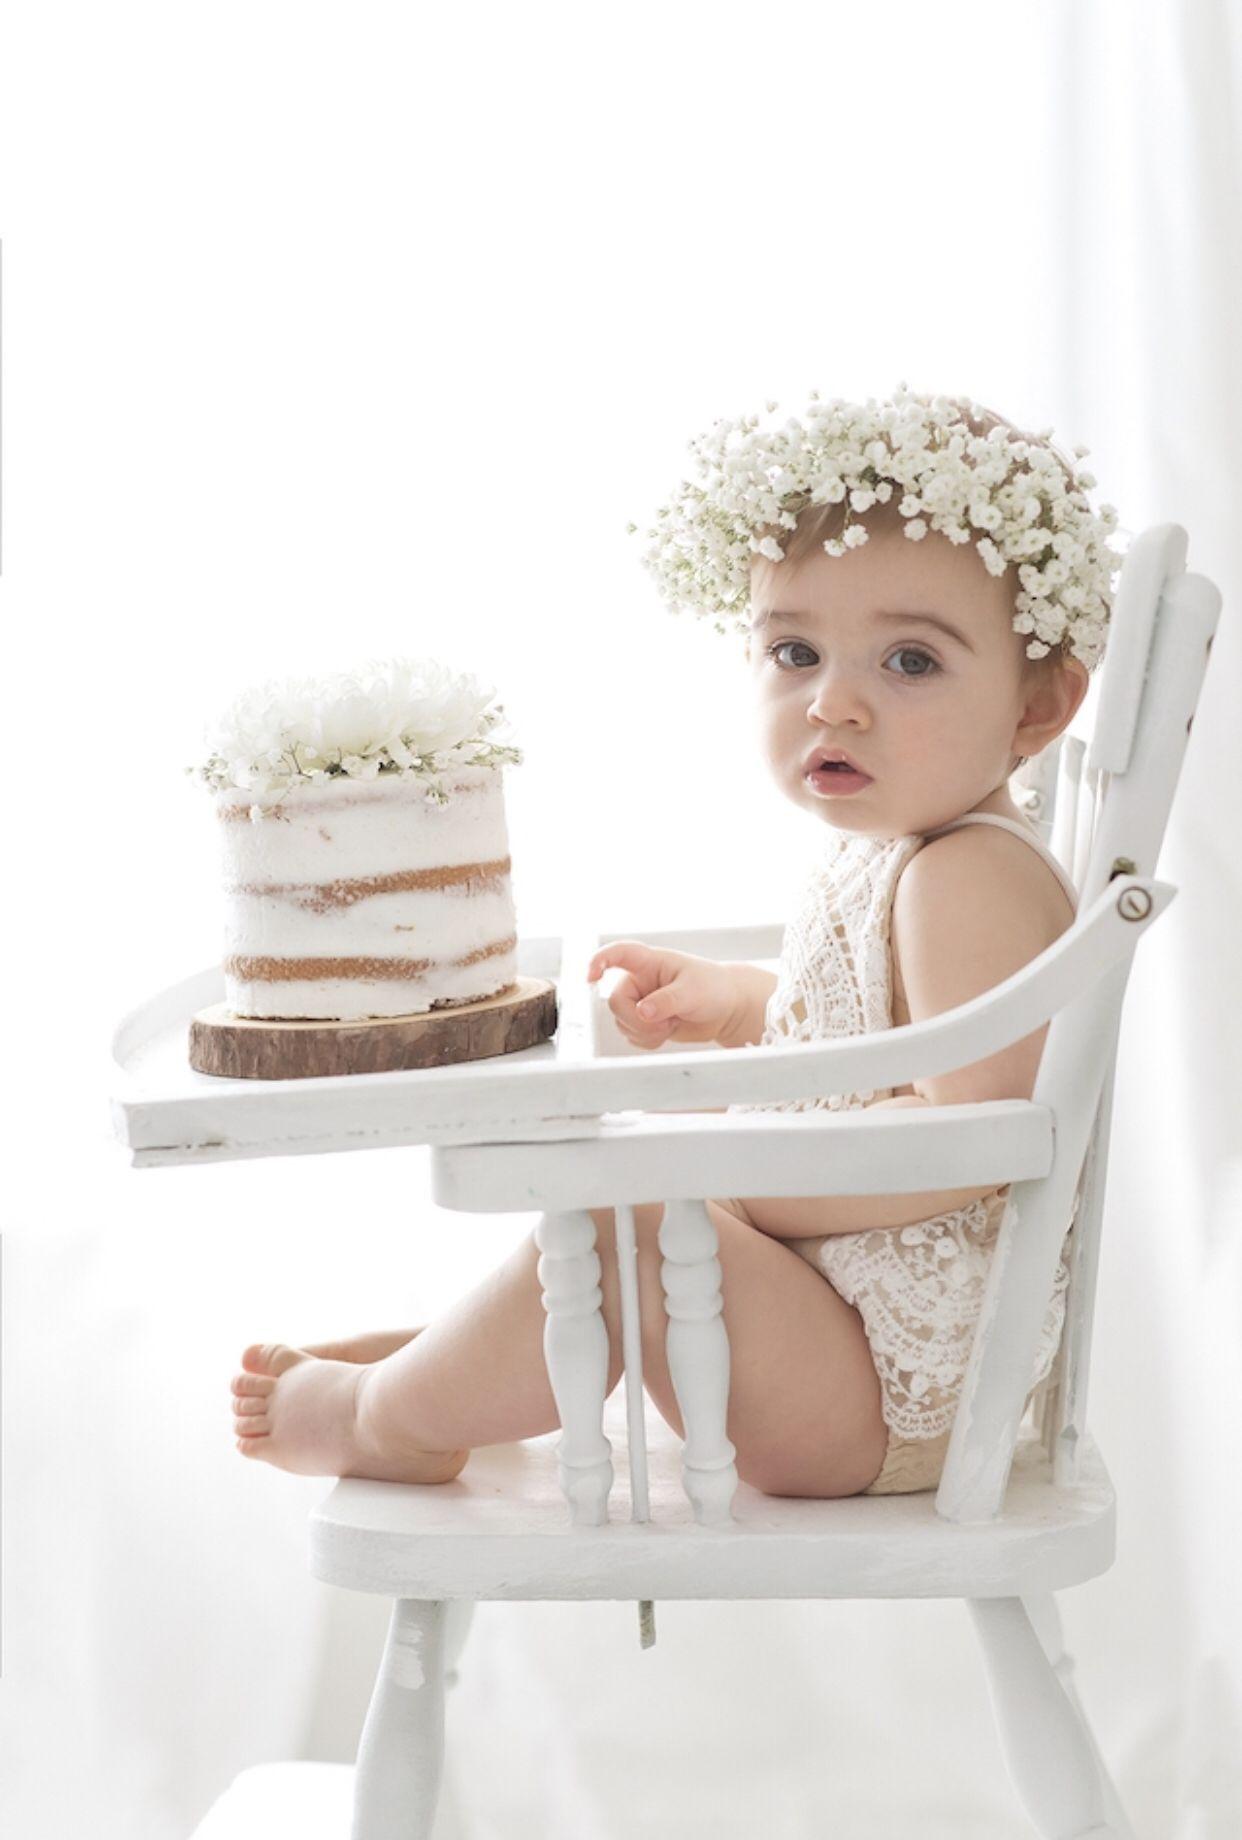 Fantastic First Birthday Cake Smash Ideas En 2020 Con Imagenes Funny Birthday Cards Online Hendilapandamsfinfo